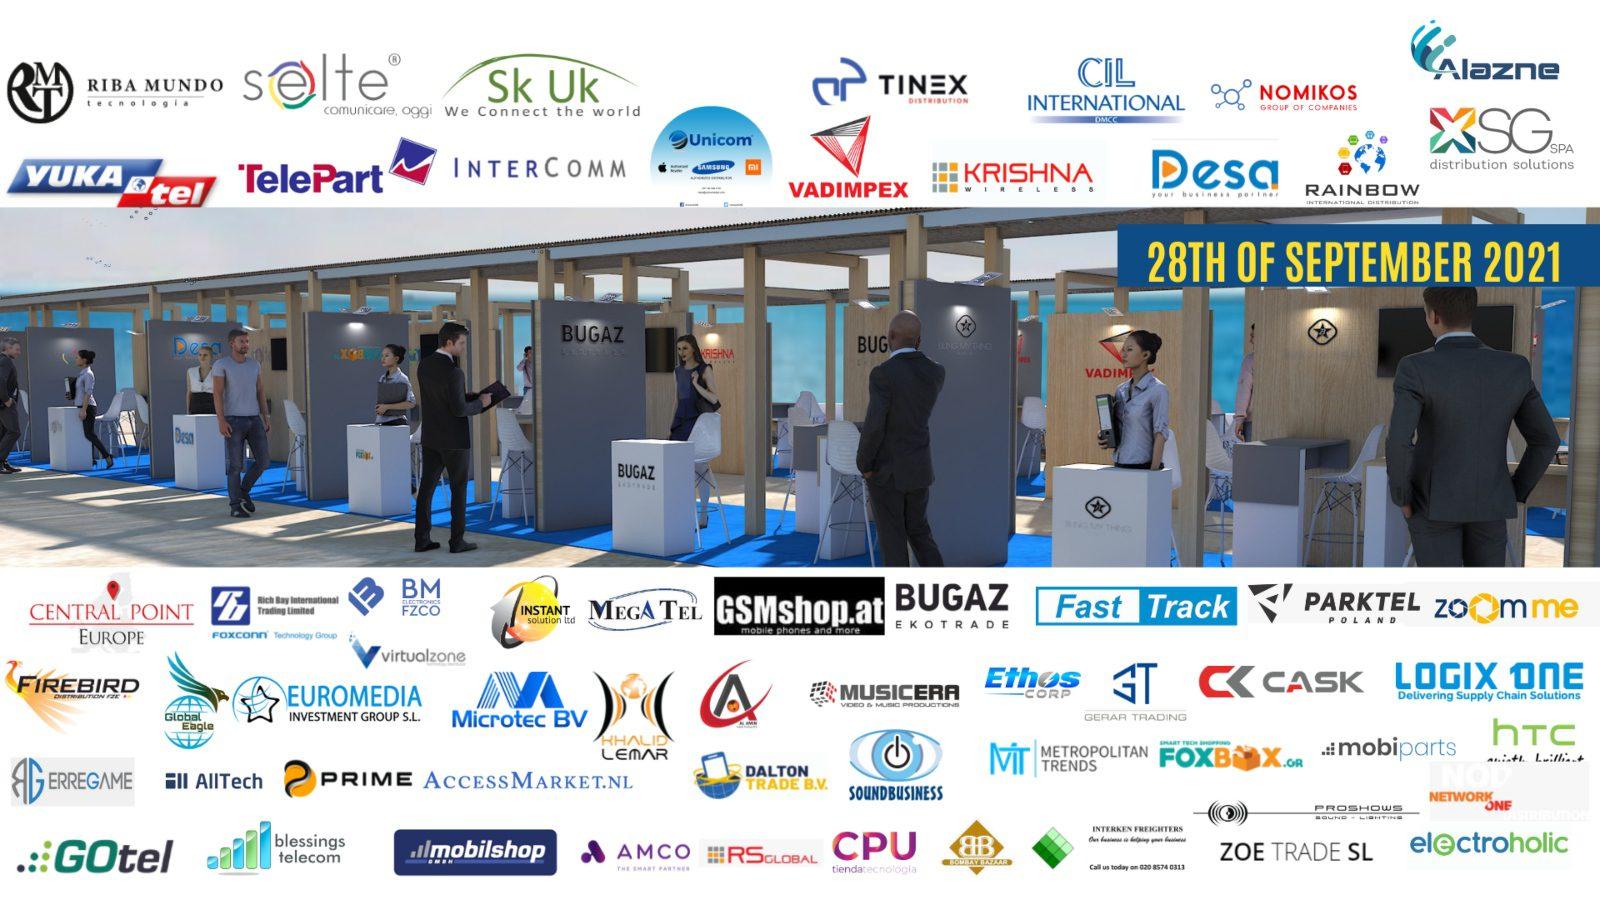 Reconnect: Μια καινοτόμα έκθεση τεχνολογίας έρχεται σε λίγες εβδομάδες στην Αθηναϊκή Ριβιέρα